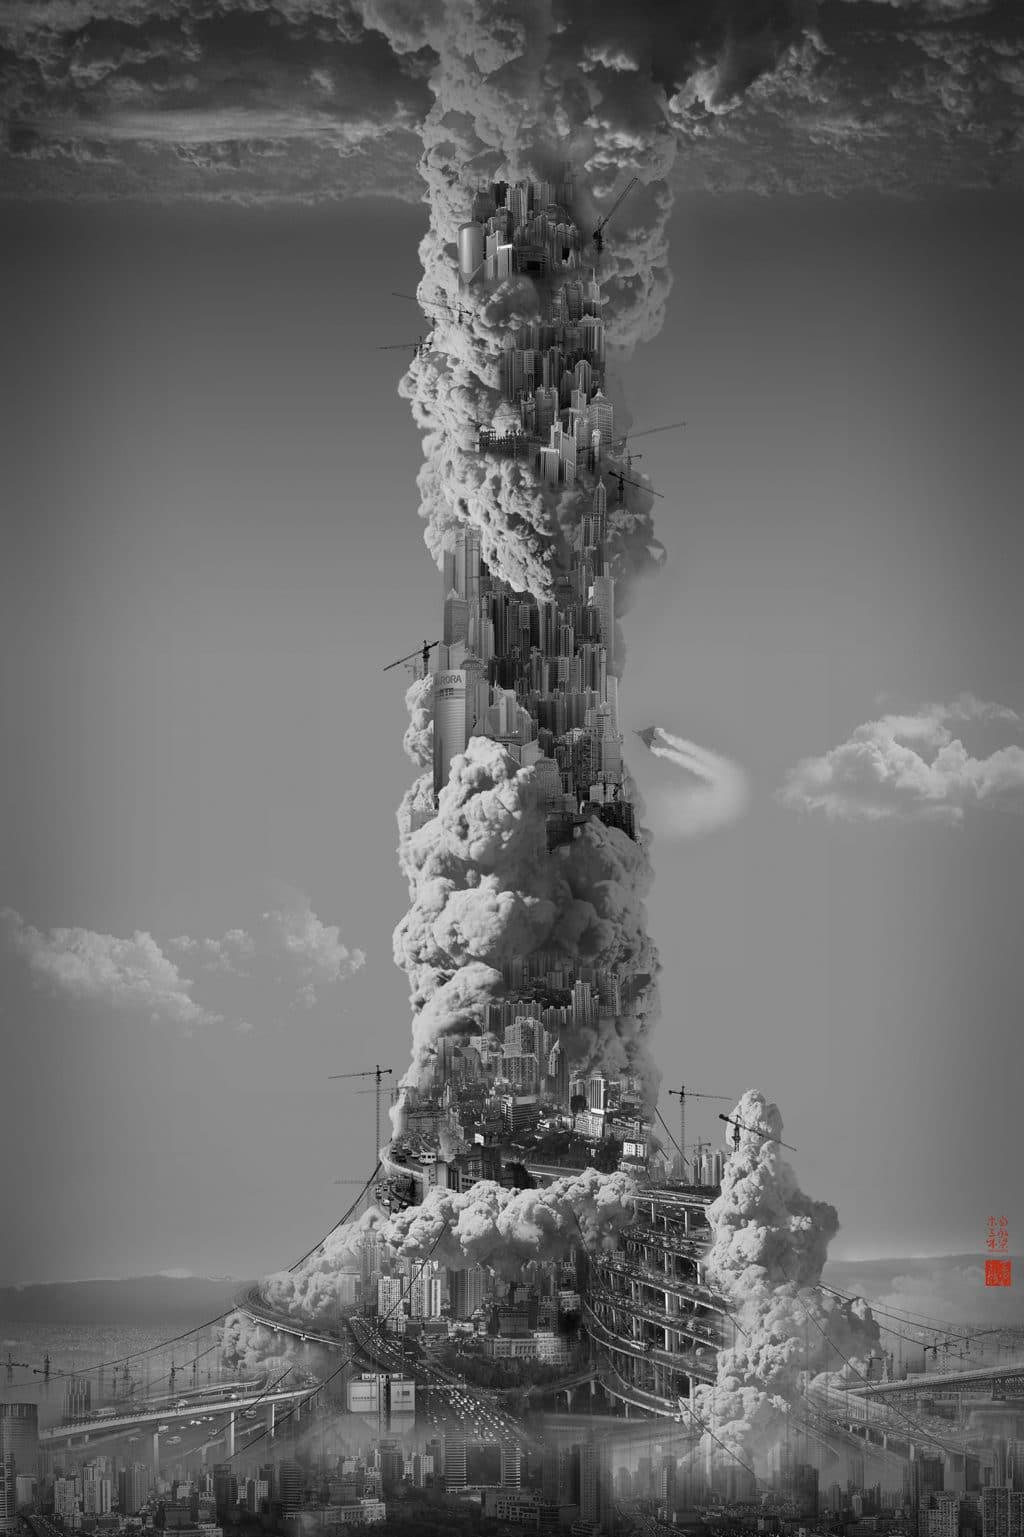 3_Yang_Yongliang_HeavenlyCity_Skyscraper©Yang_Yongliang